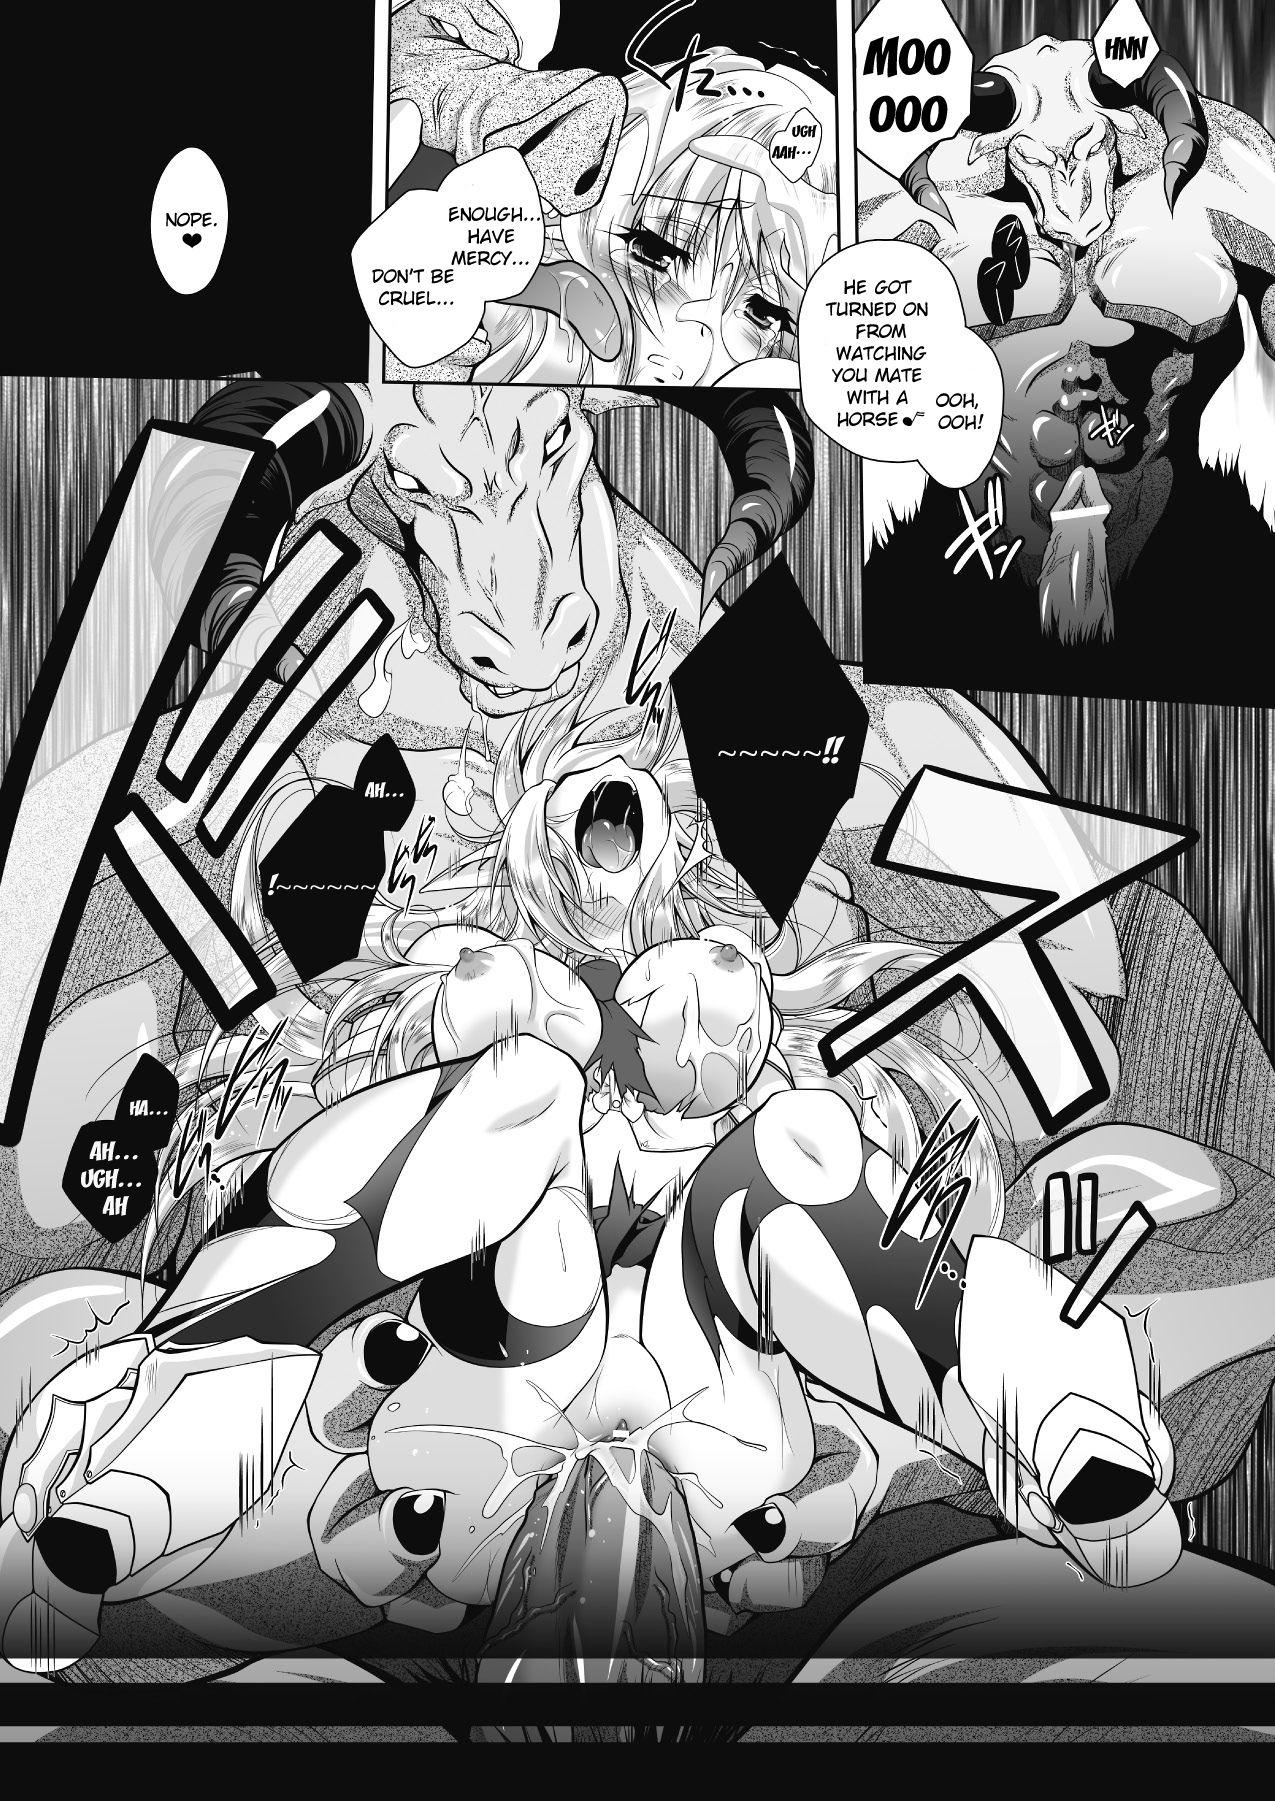 Juuyoku ni Kegareta Erufu Hime Kishi Sefiria | An Elf Sullied by Bestial Lust Princess Knight Sefiria 20